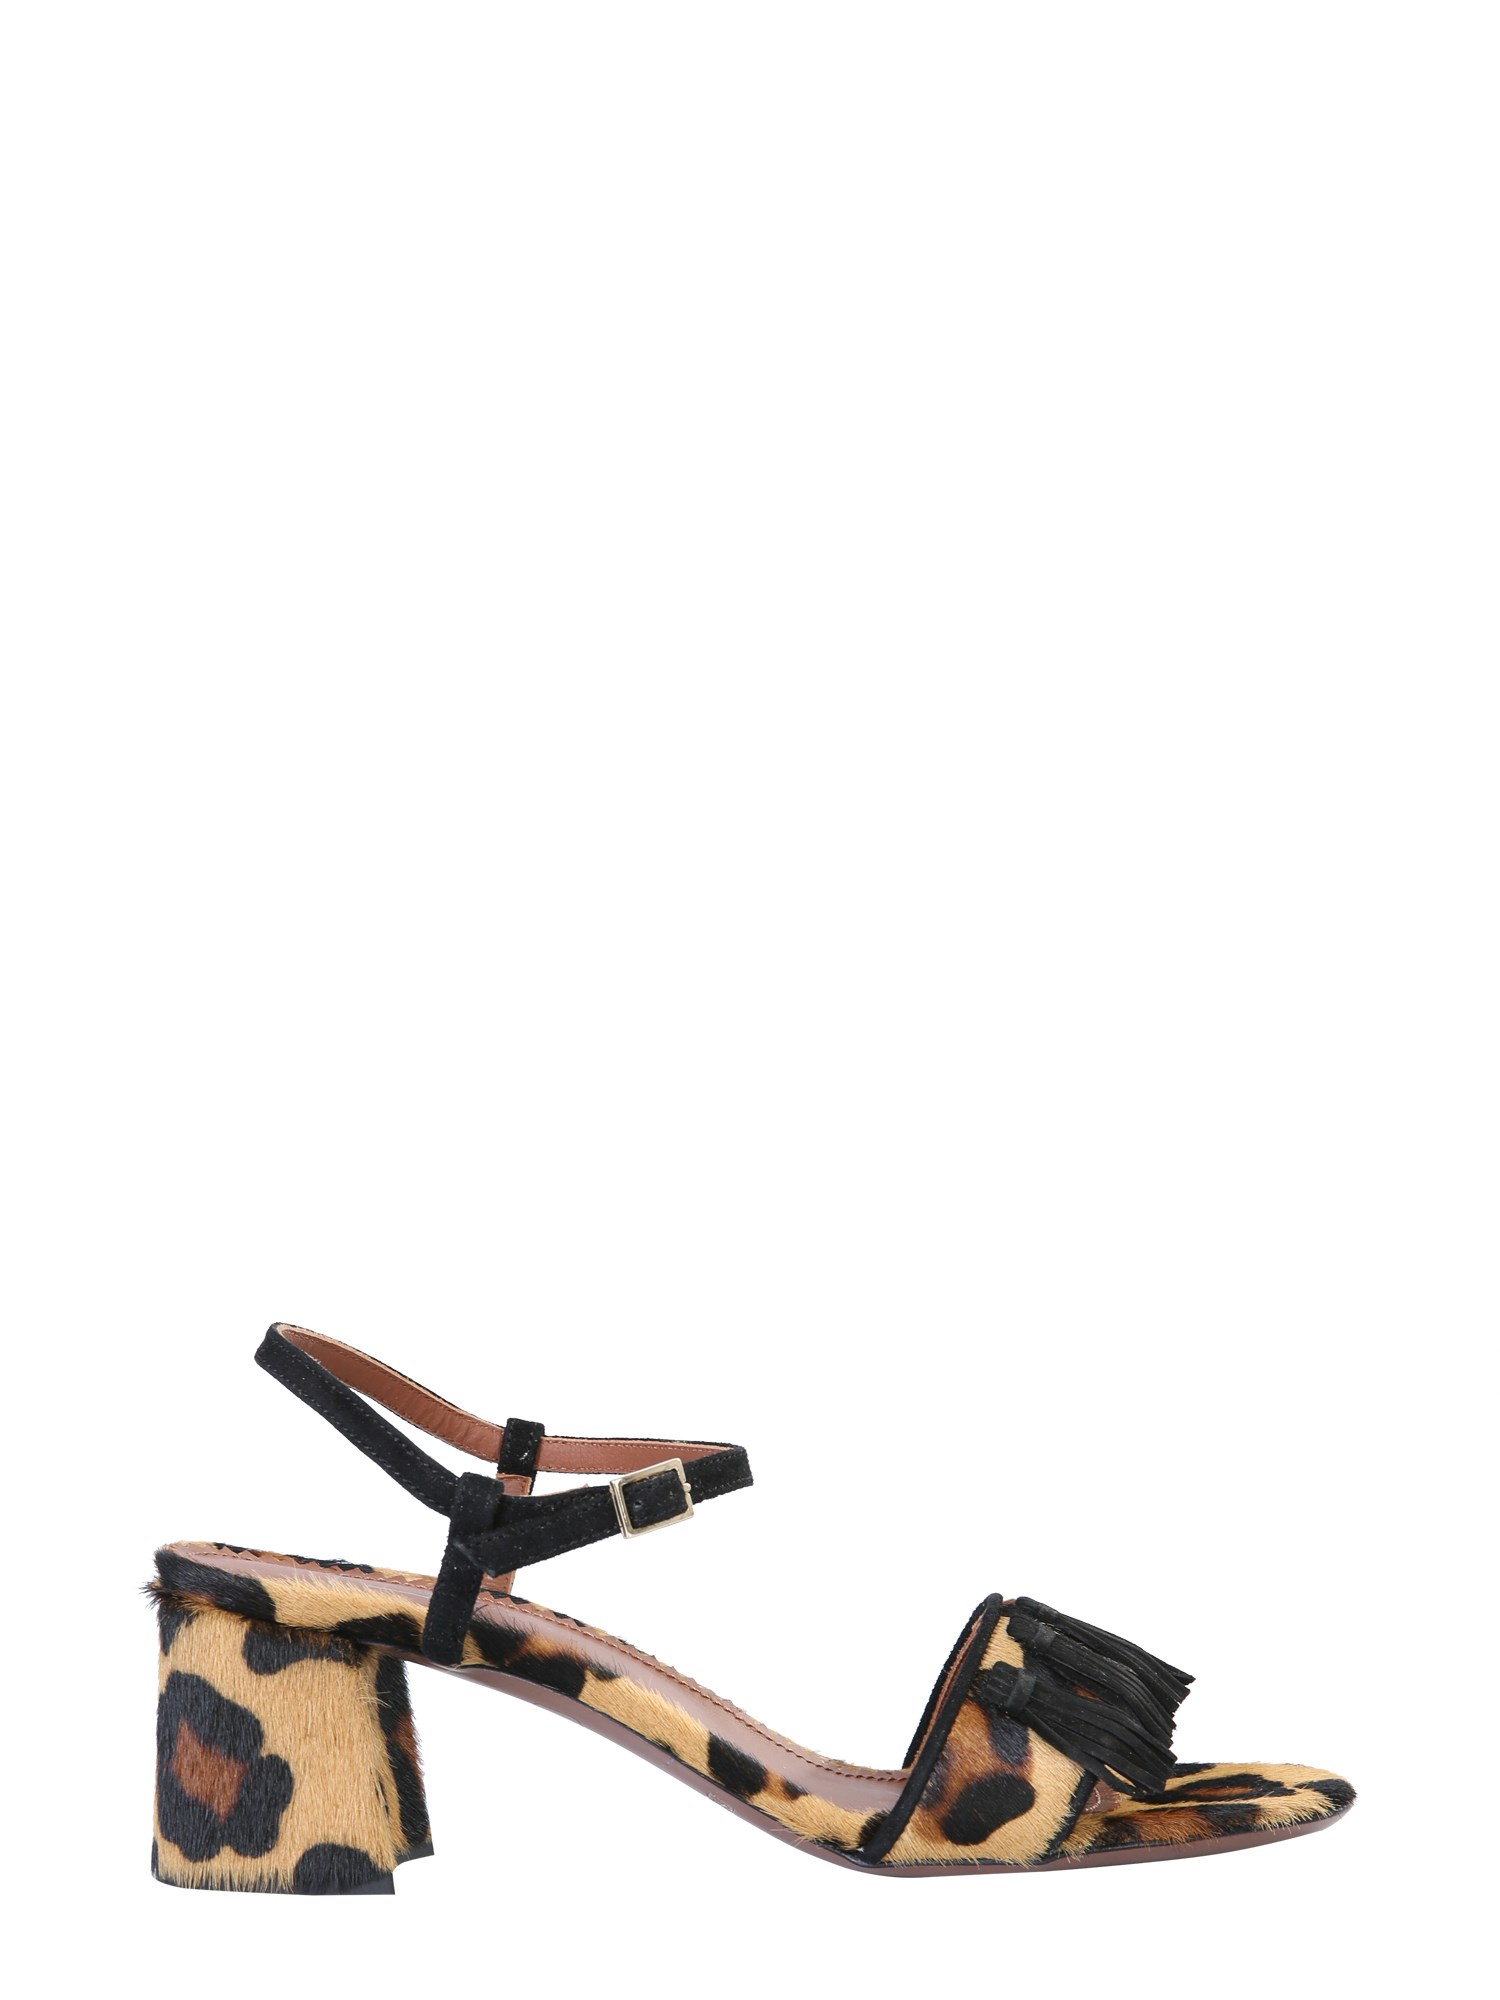 Sandals with animal print - l'autre chose - Modalova